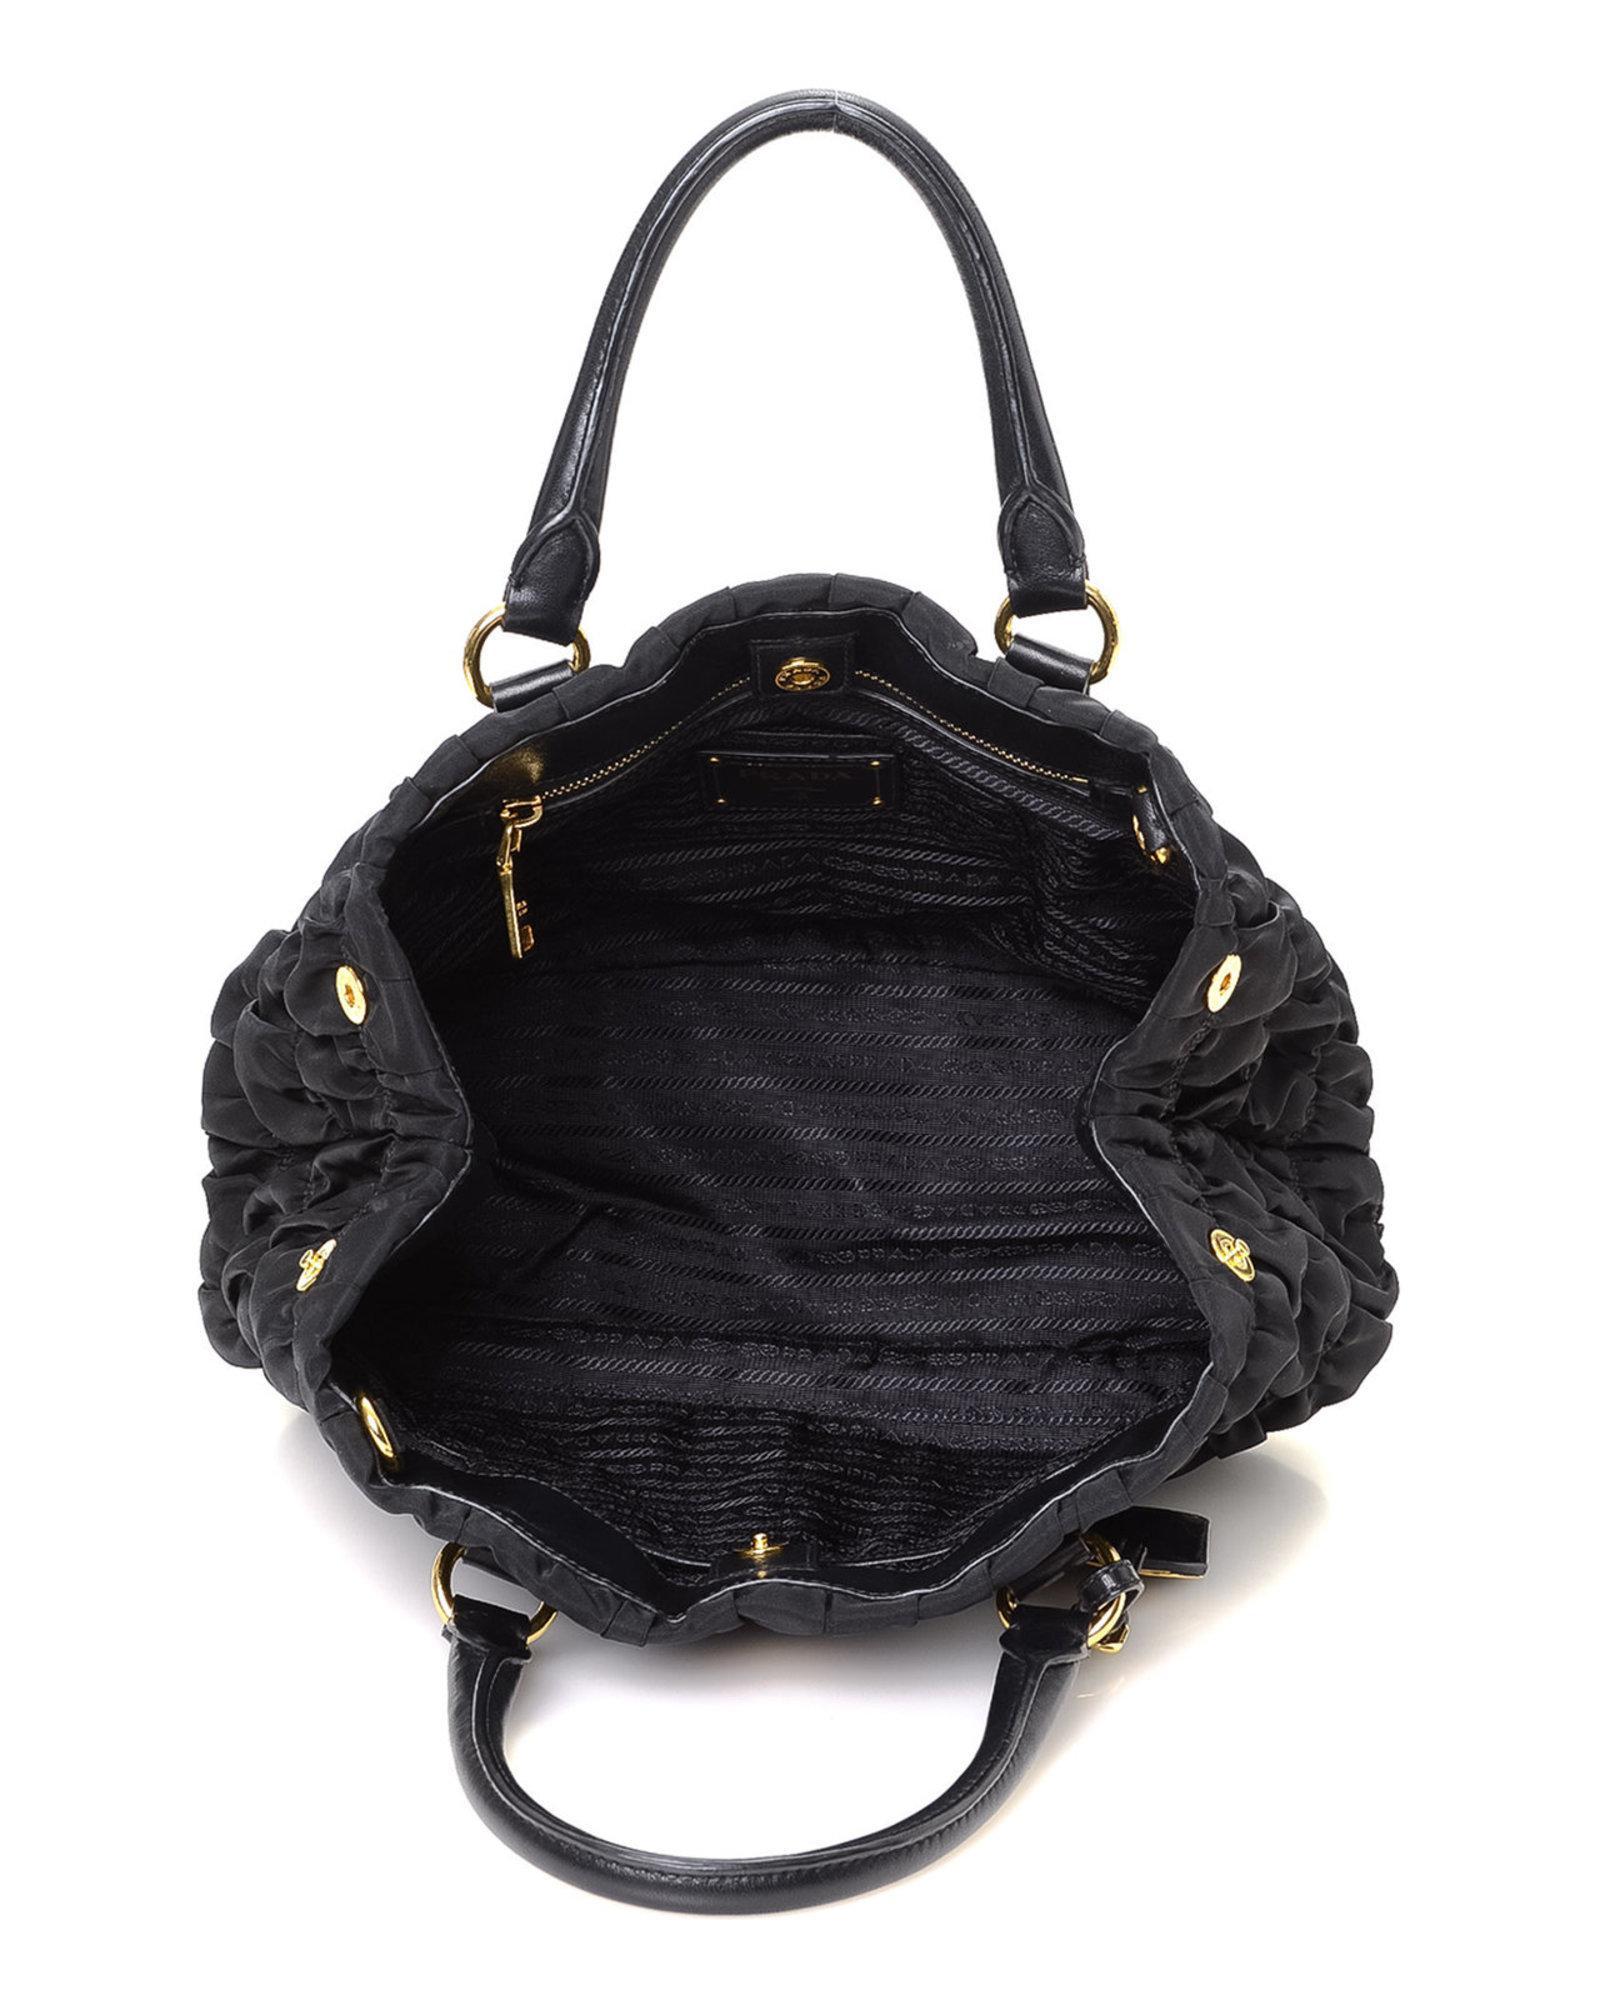 8b2352022a08 get lyst prada tessuto nappa gaufre tote vintage in black 2d907 b0a88